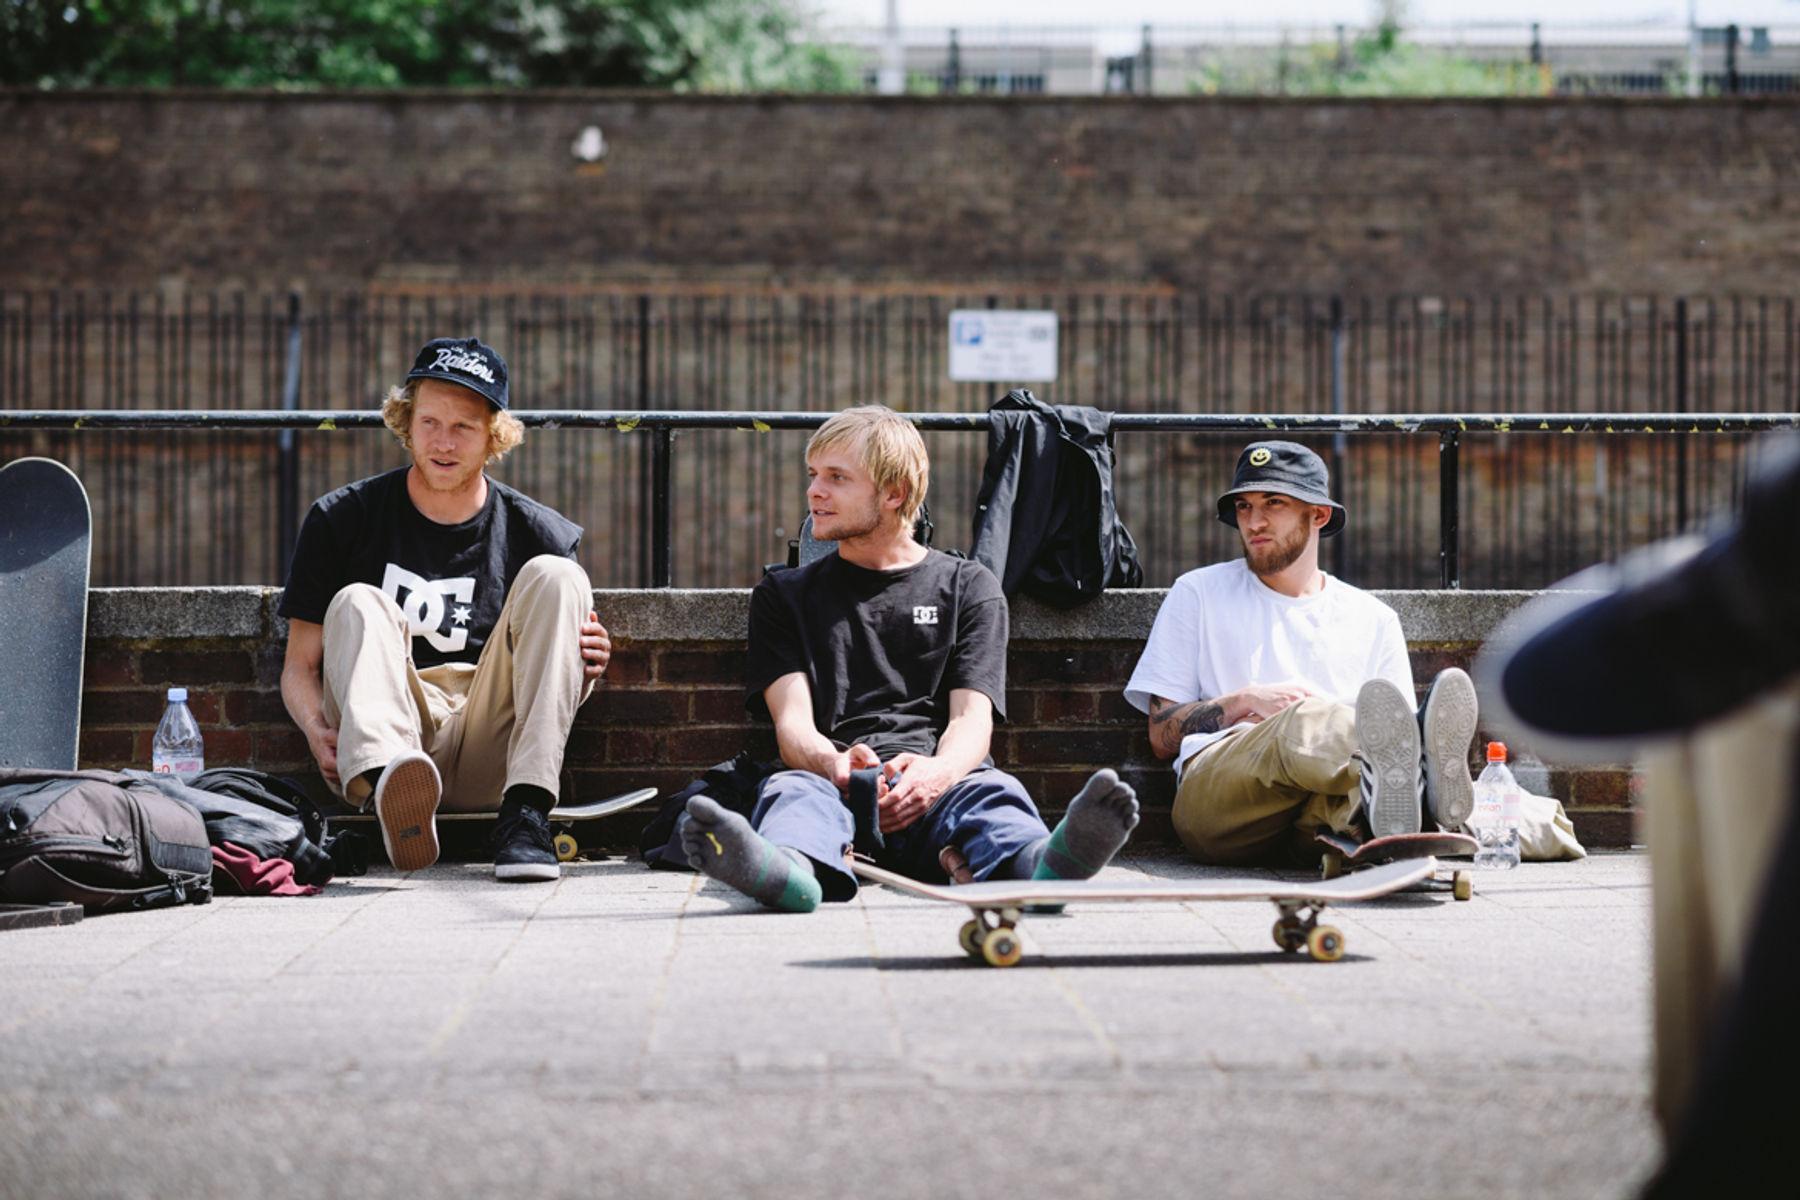 _IHC2946e-Wes-Kremer-Madars-Apse-DC-Special-Delivery-Skate-Tour-BTS-London-May-2015-Photographer-Maksim-Kalanep